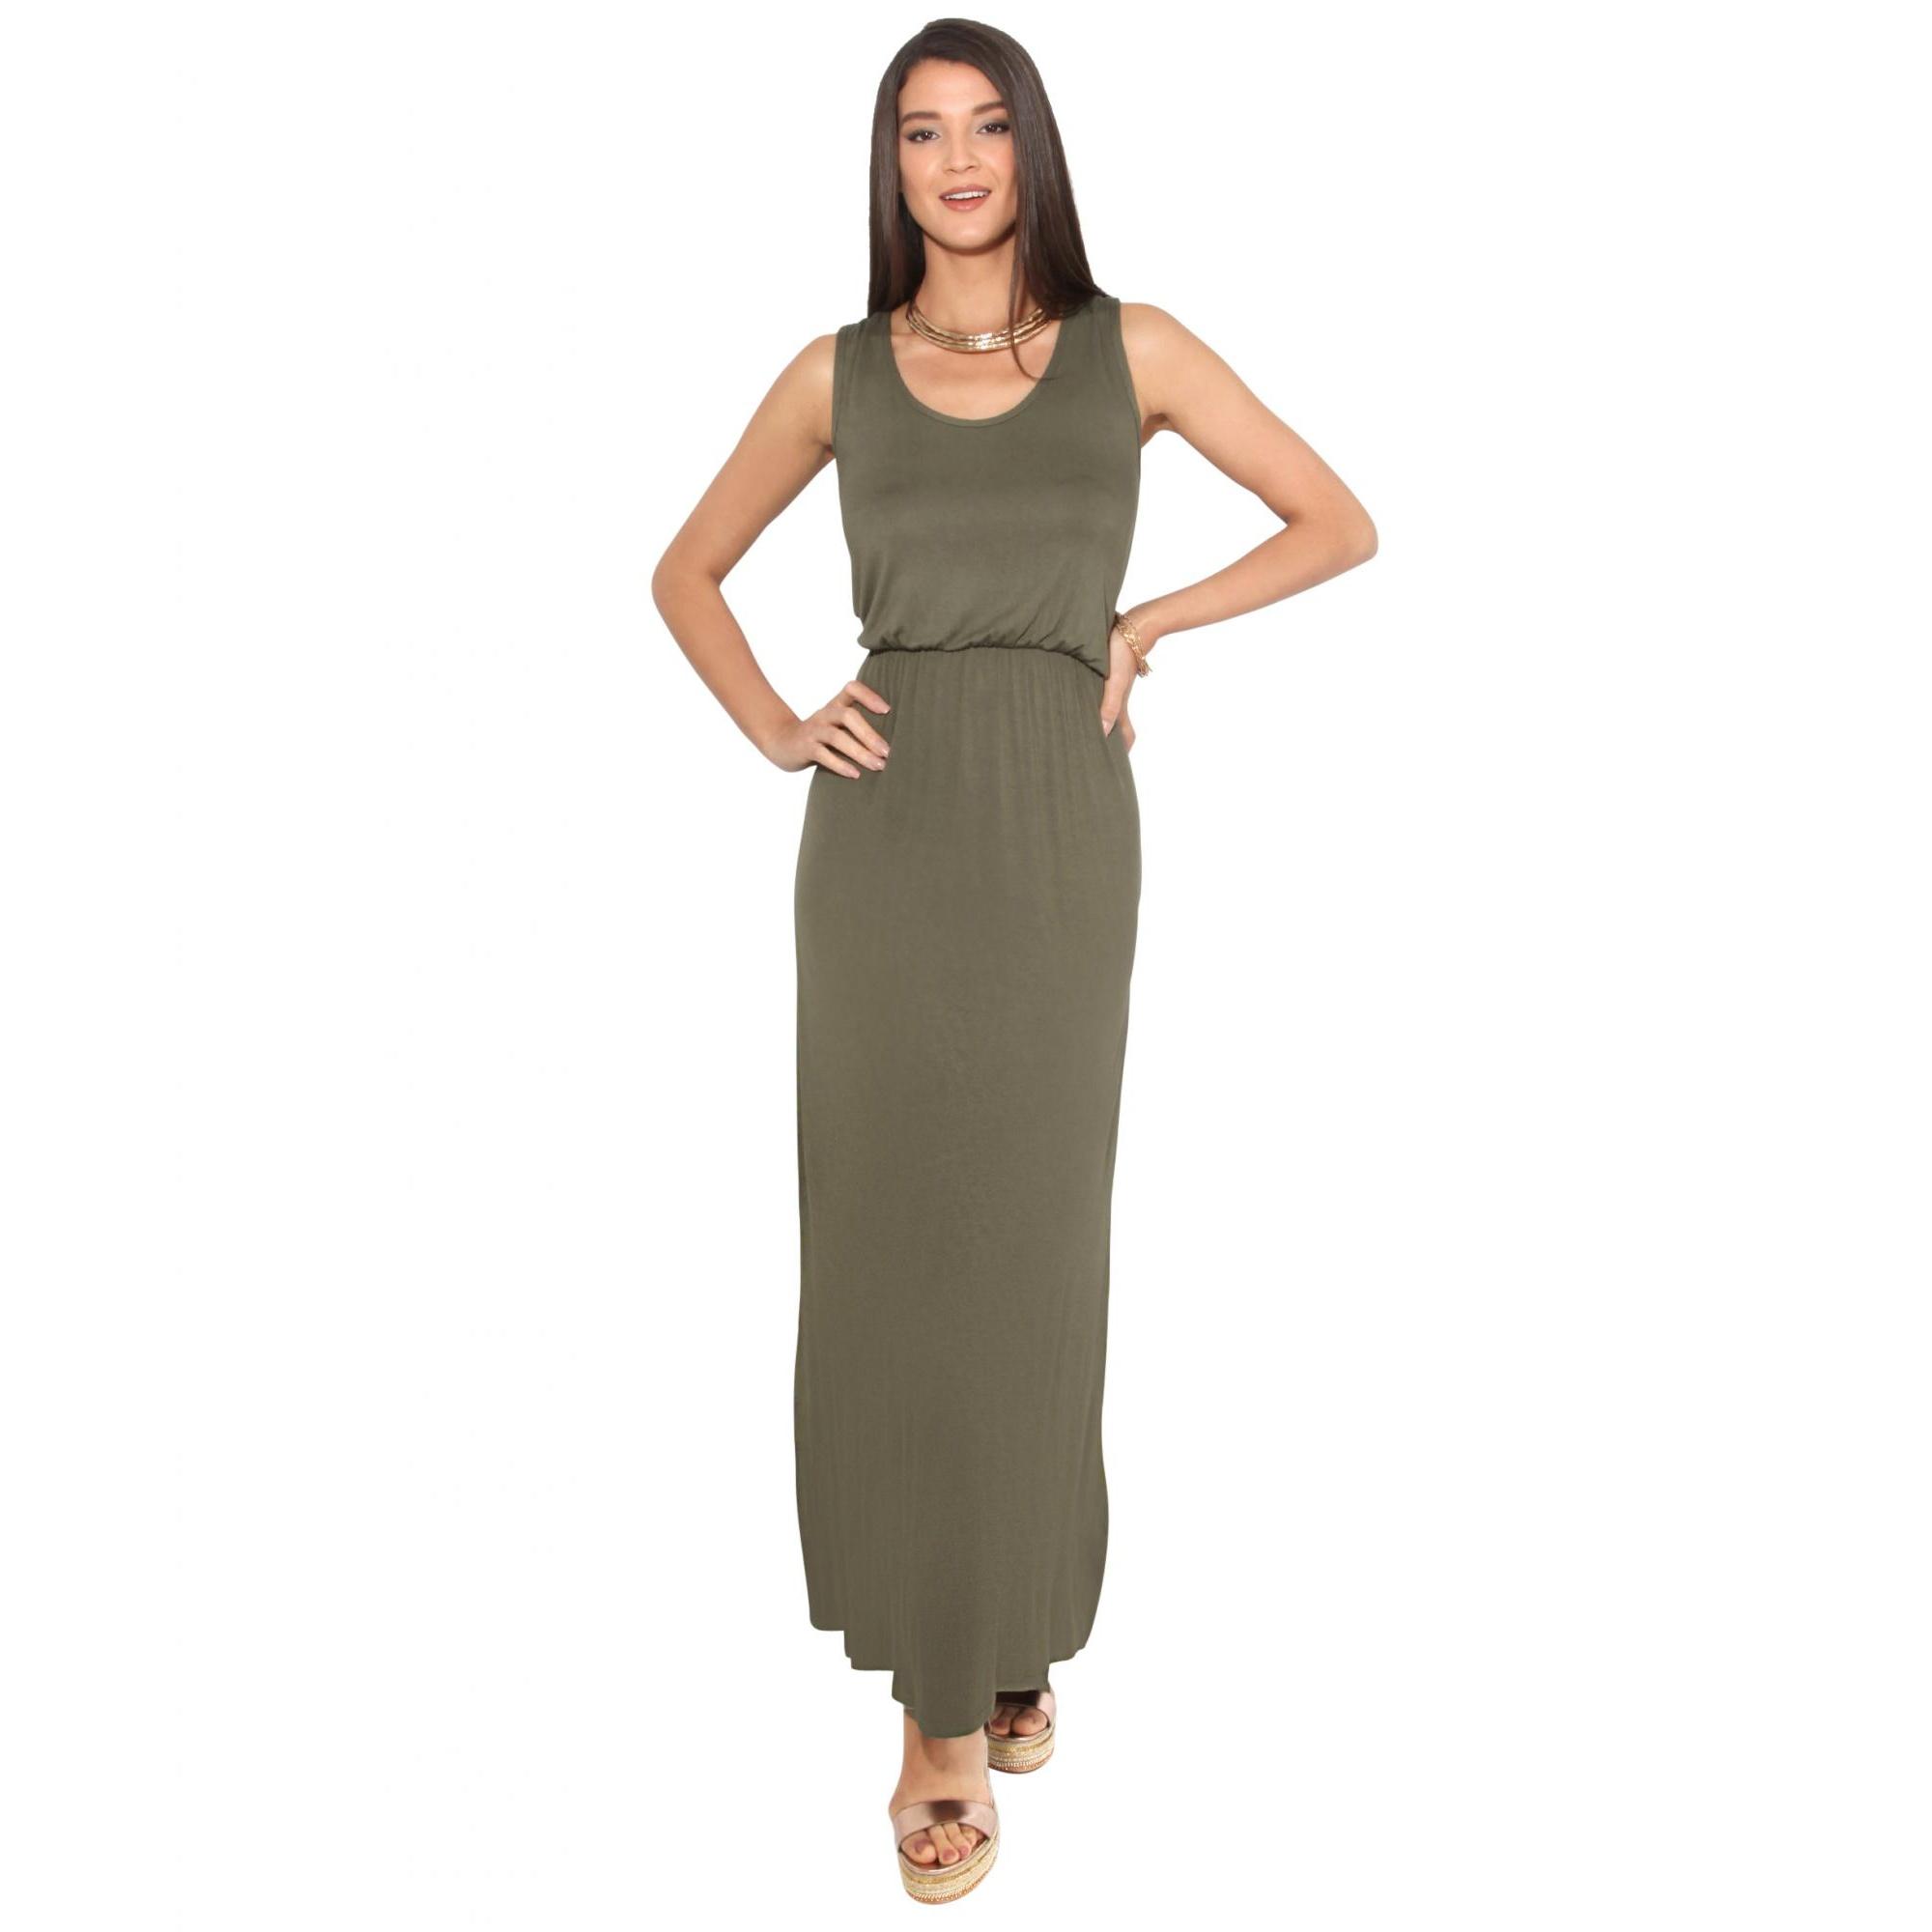 Krisp Womens/Ladies Shirred Sleeveless Maxi Dress (20 UK) (Khaki)